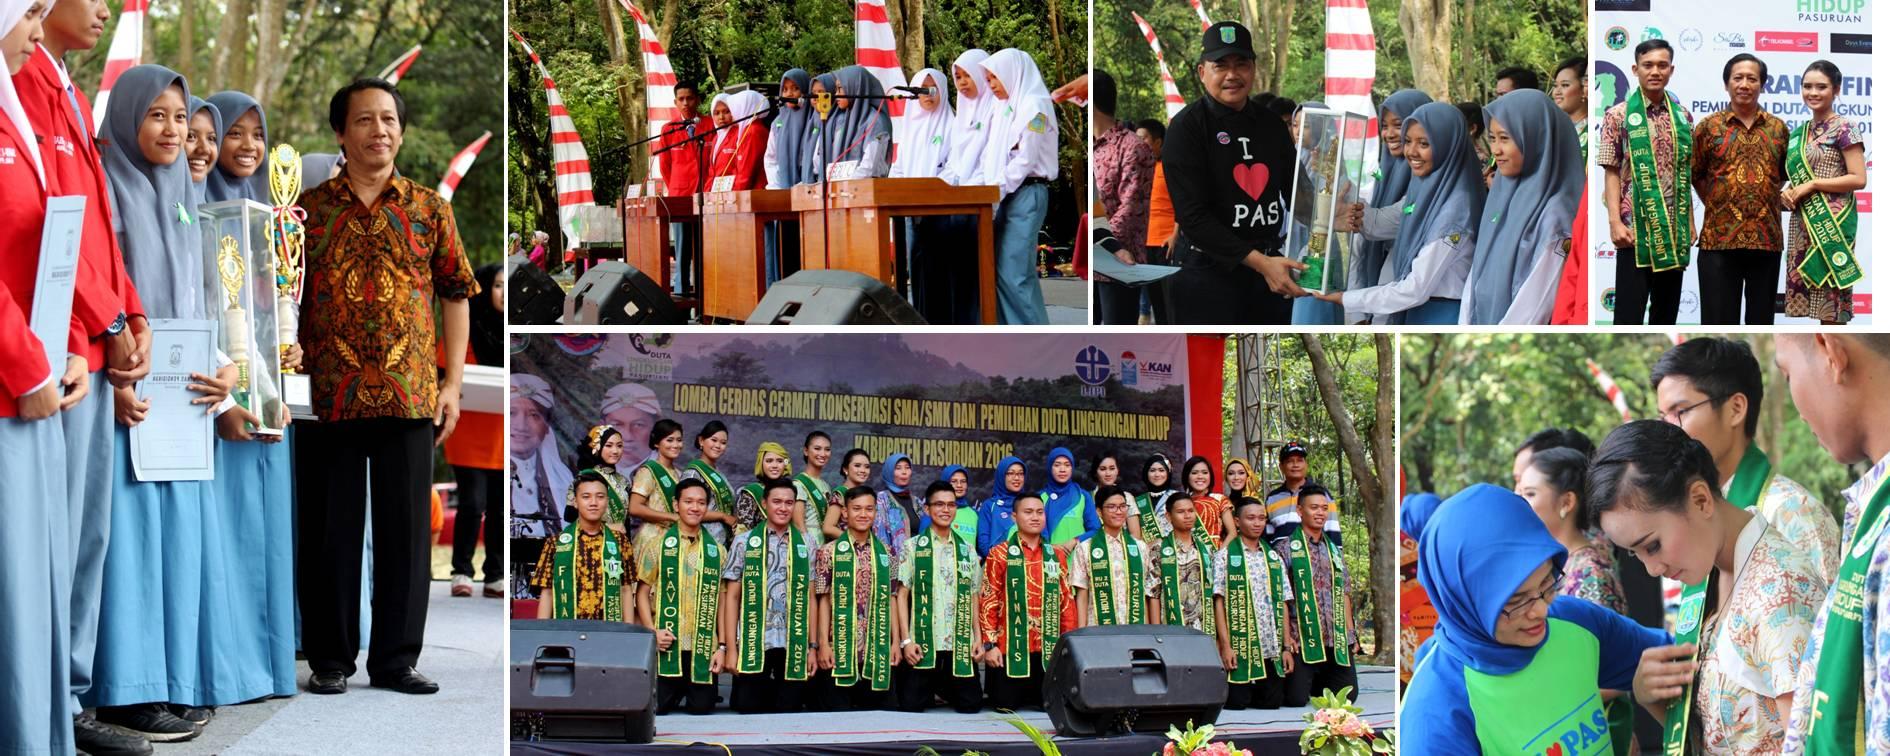 Kebun Raya Purwodadi Rangka Memperingati Hari Jadi Kabupaten Pasuruan 1087